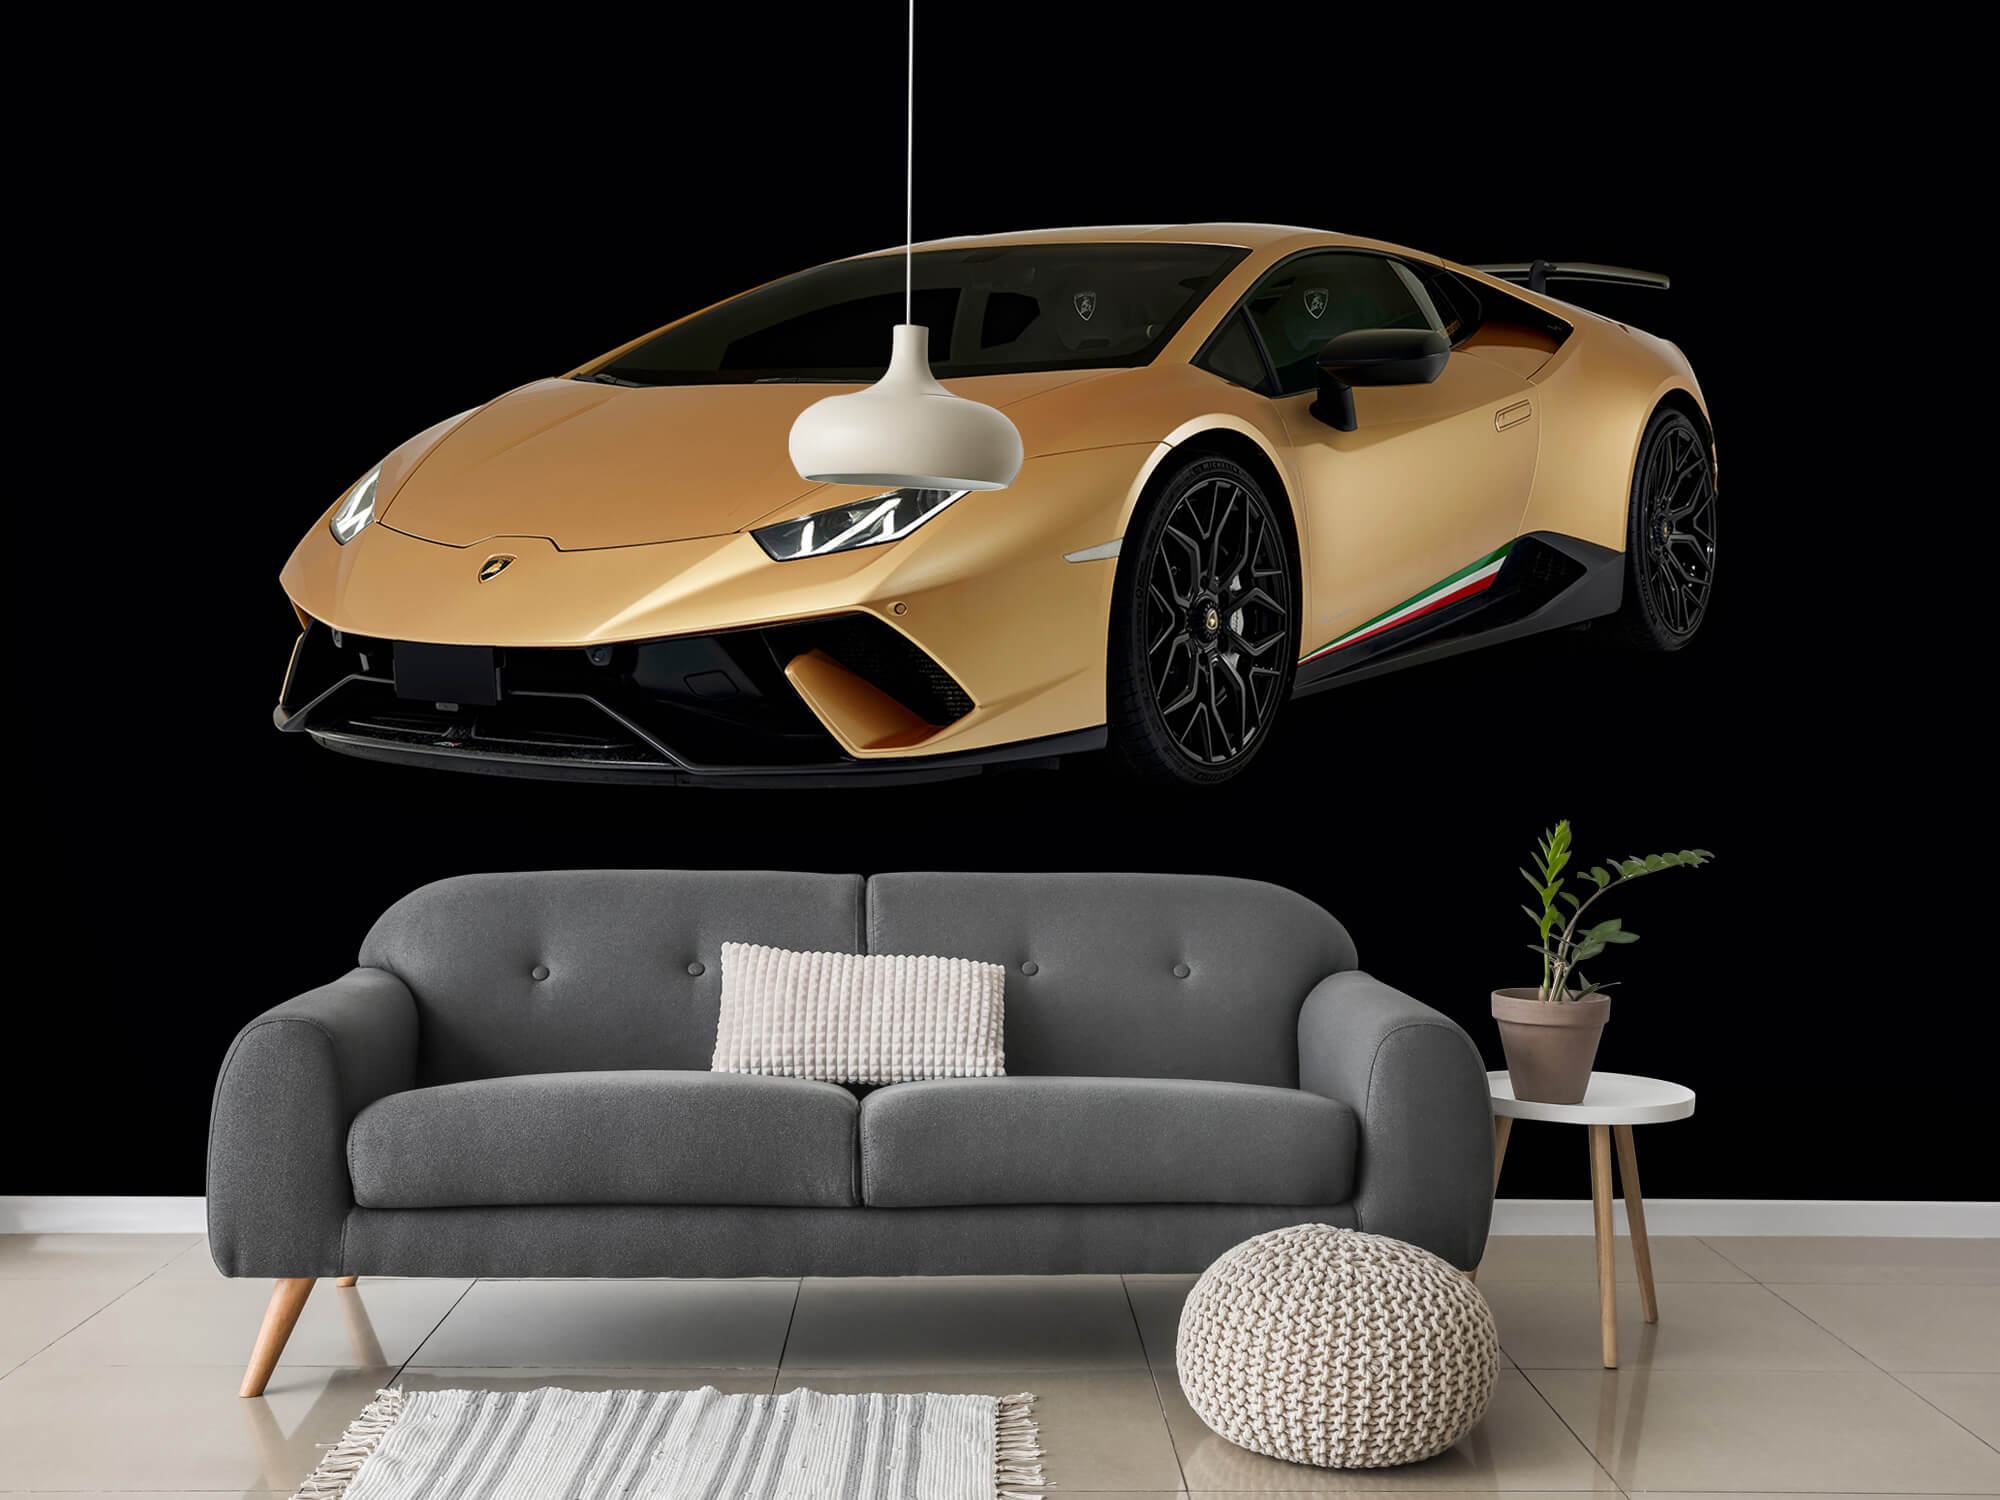 Wallpaper Lamborghini Huracán - Rechter voorkant, zwart 15